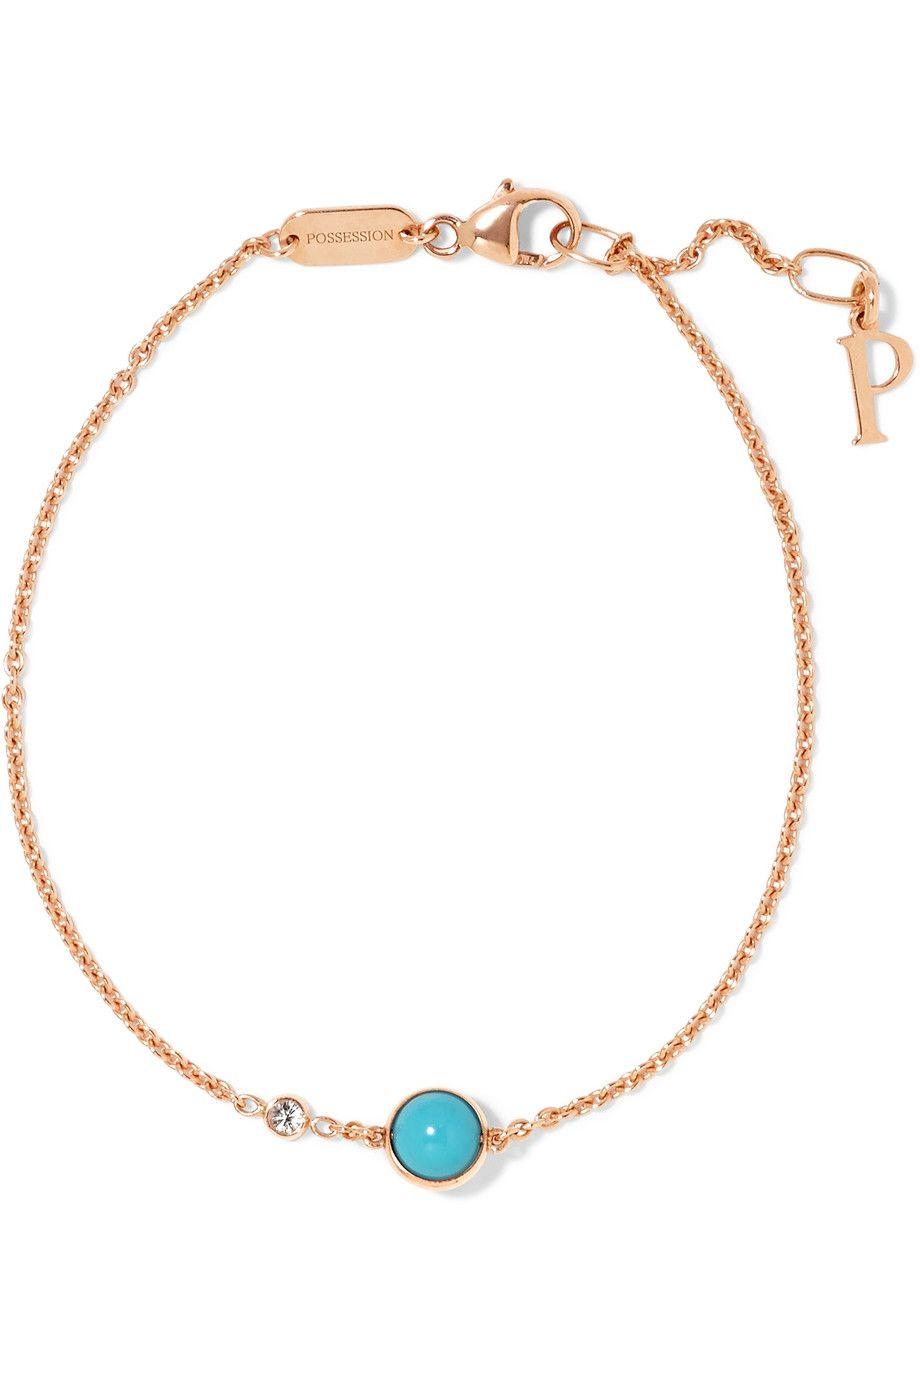 Piaget possession karat rose gold turquoise and diamond